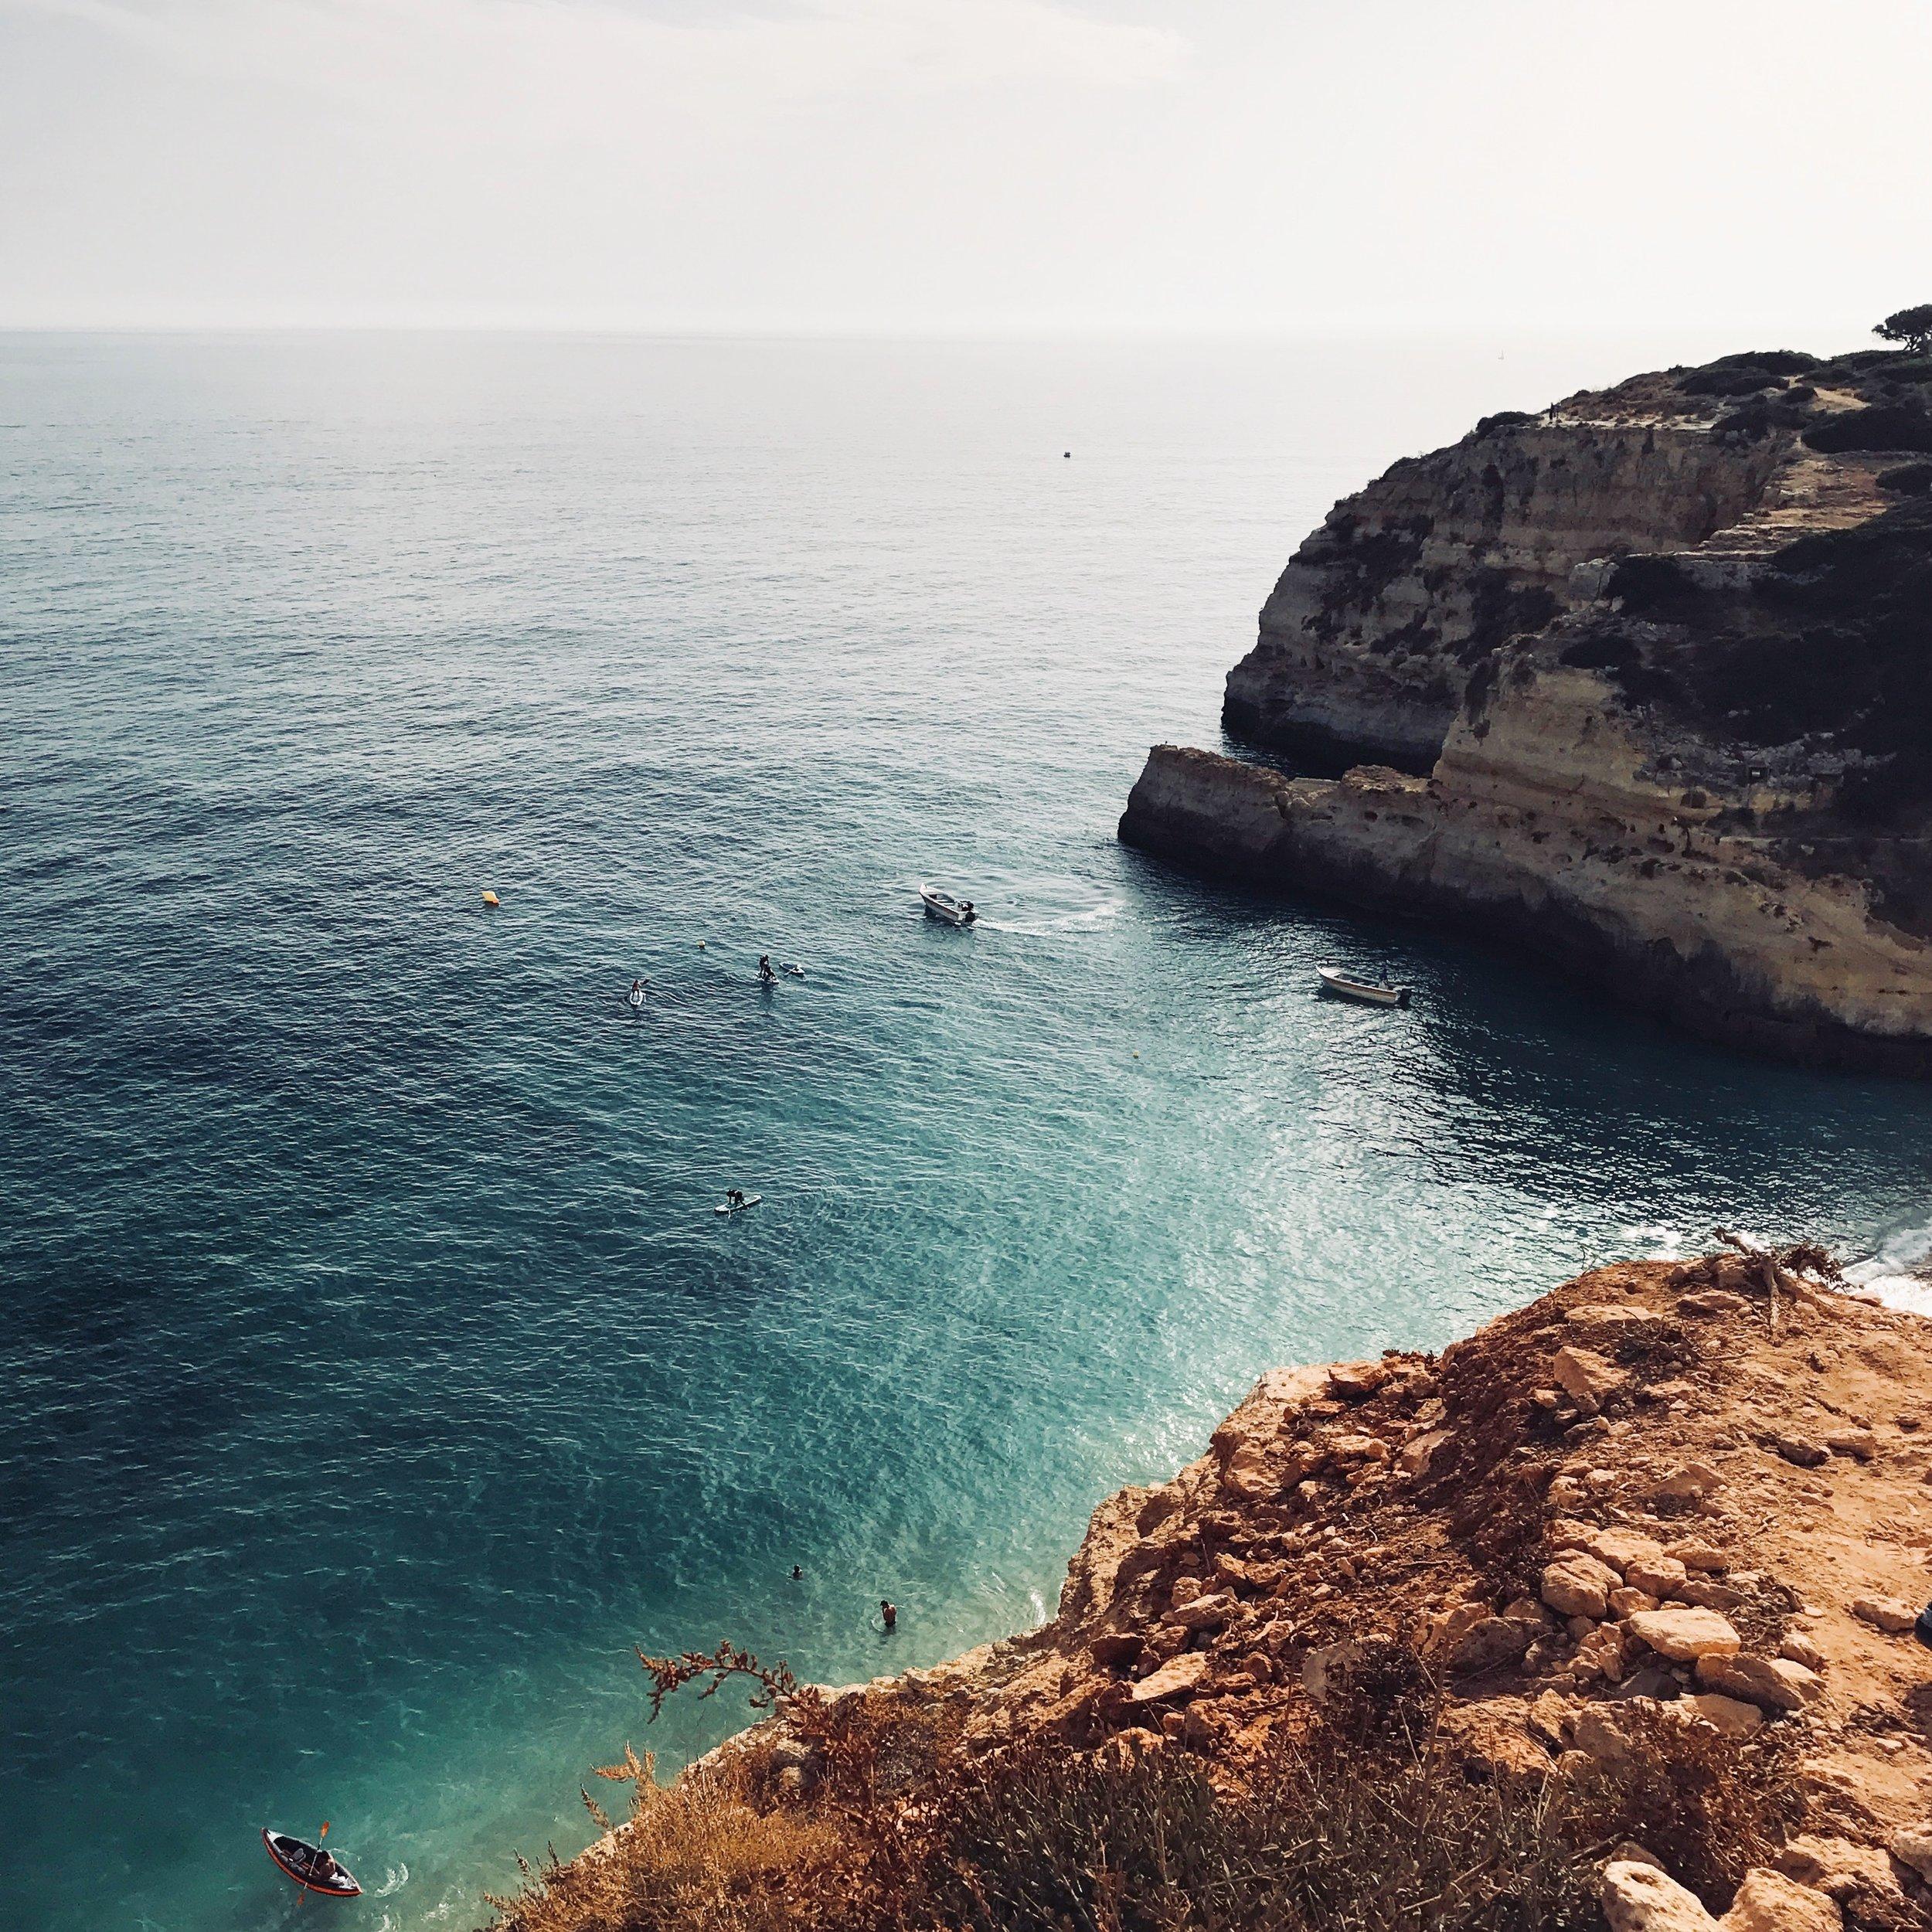 The Portuguese Ocean